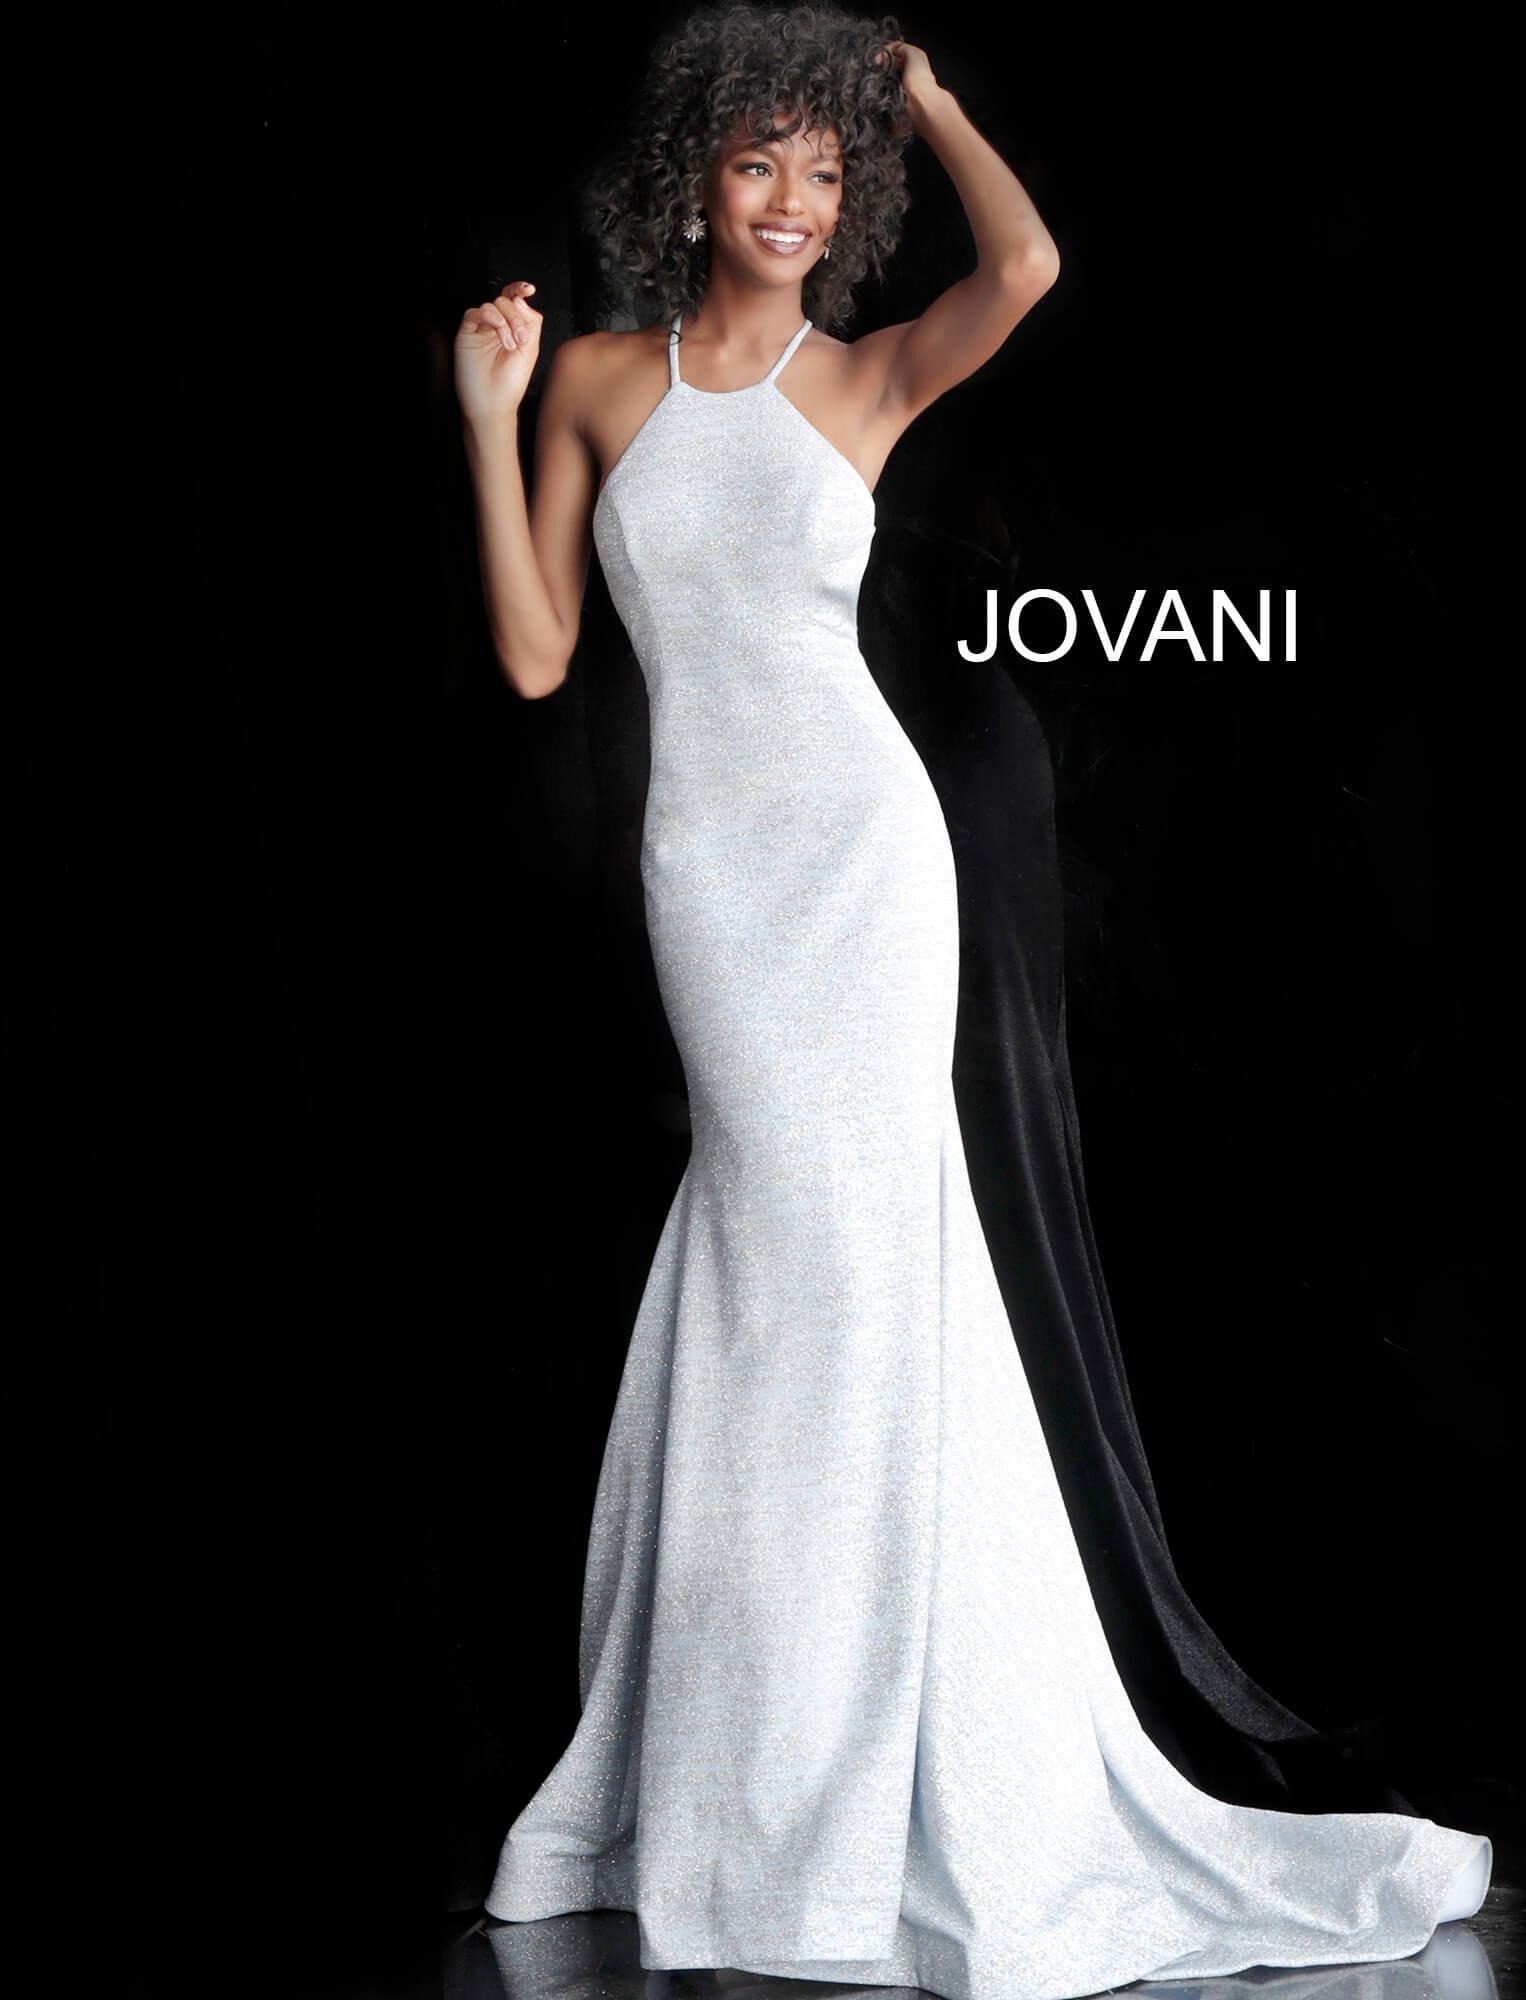 e383121c Jovani 65416 - High Neckline Fitted Glitter Mermaid Dress